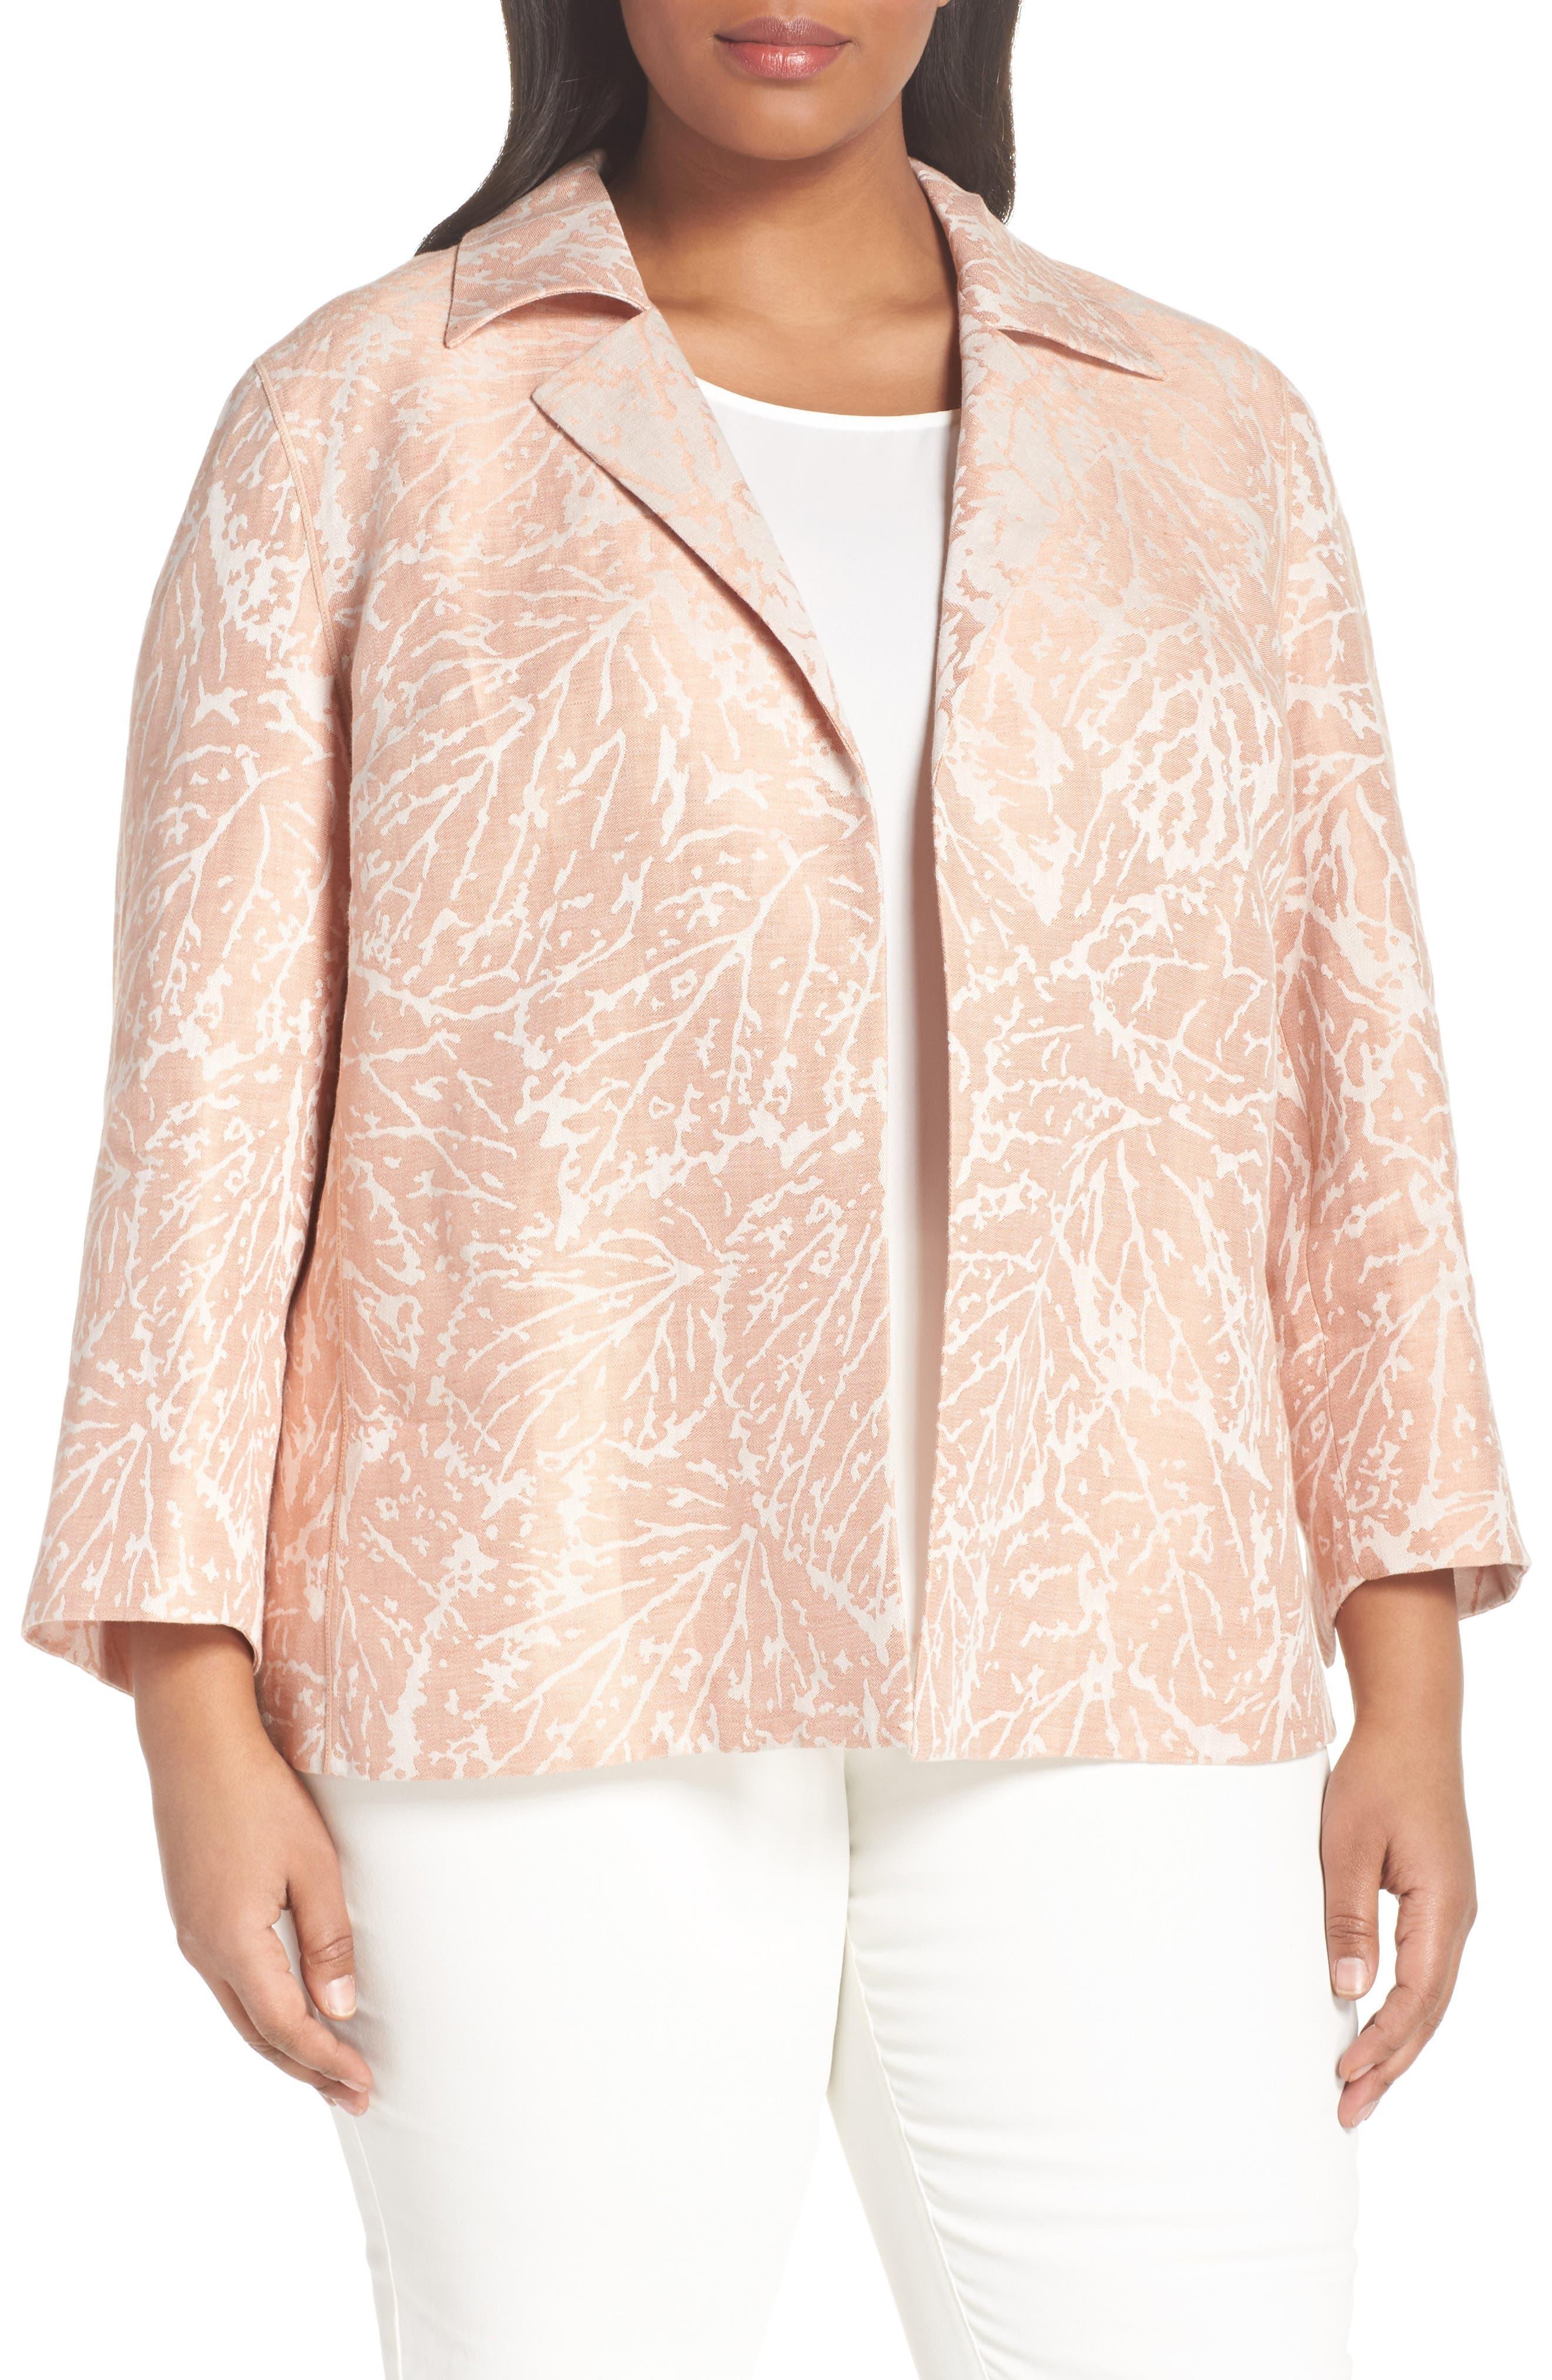 Phillipe Linen Jacket,                         Main,                         color, Rose Quartz Multi